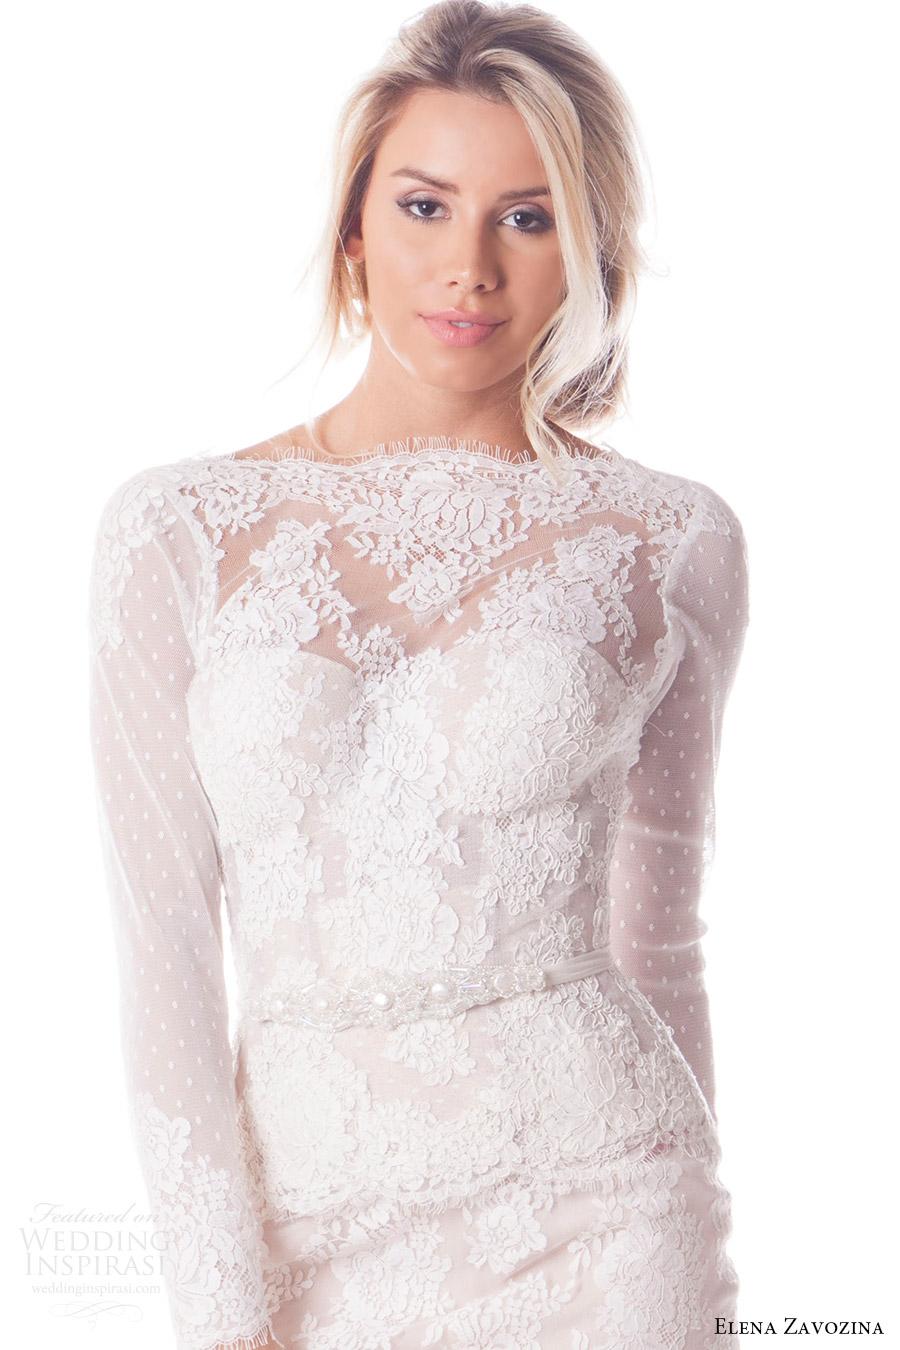 elena zavozina bridal accessories 2016 wedding pearl sash belt (viola) fv